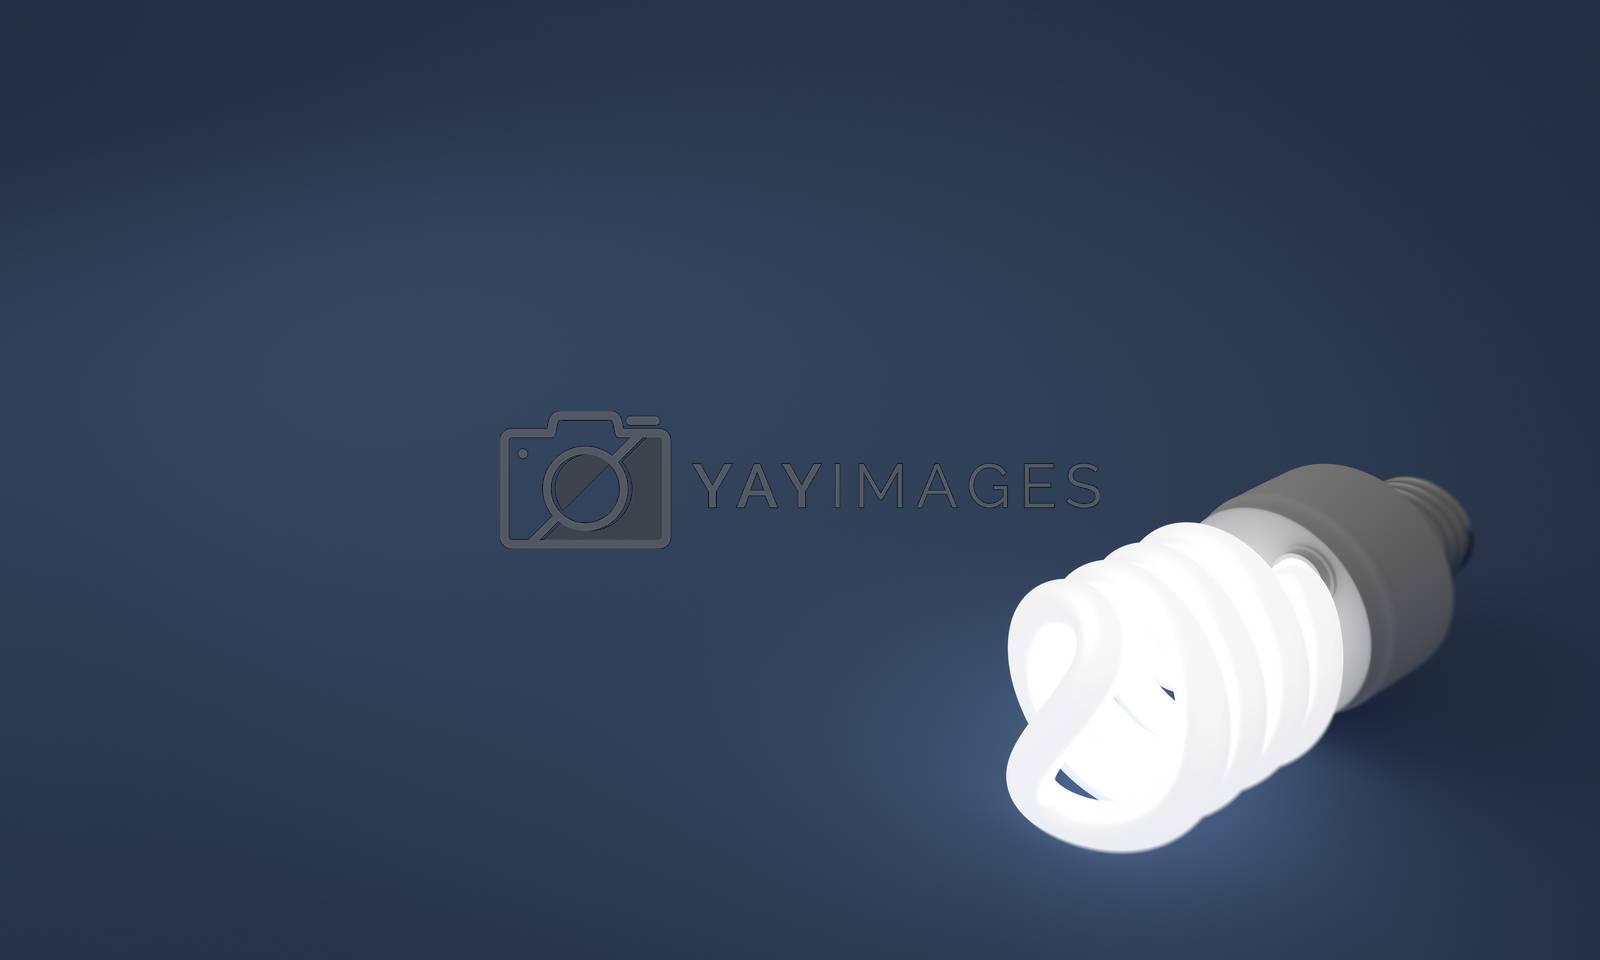 A lit spiral energy saving lightbulb on a blue background.